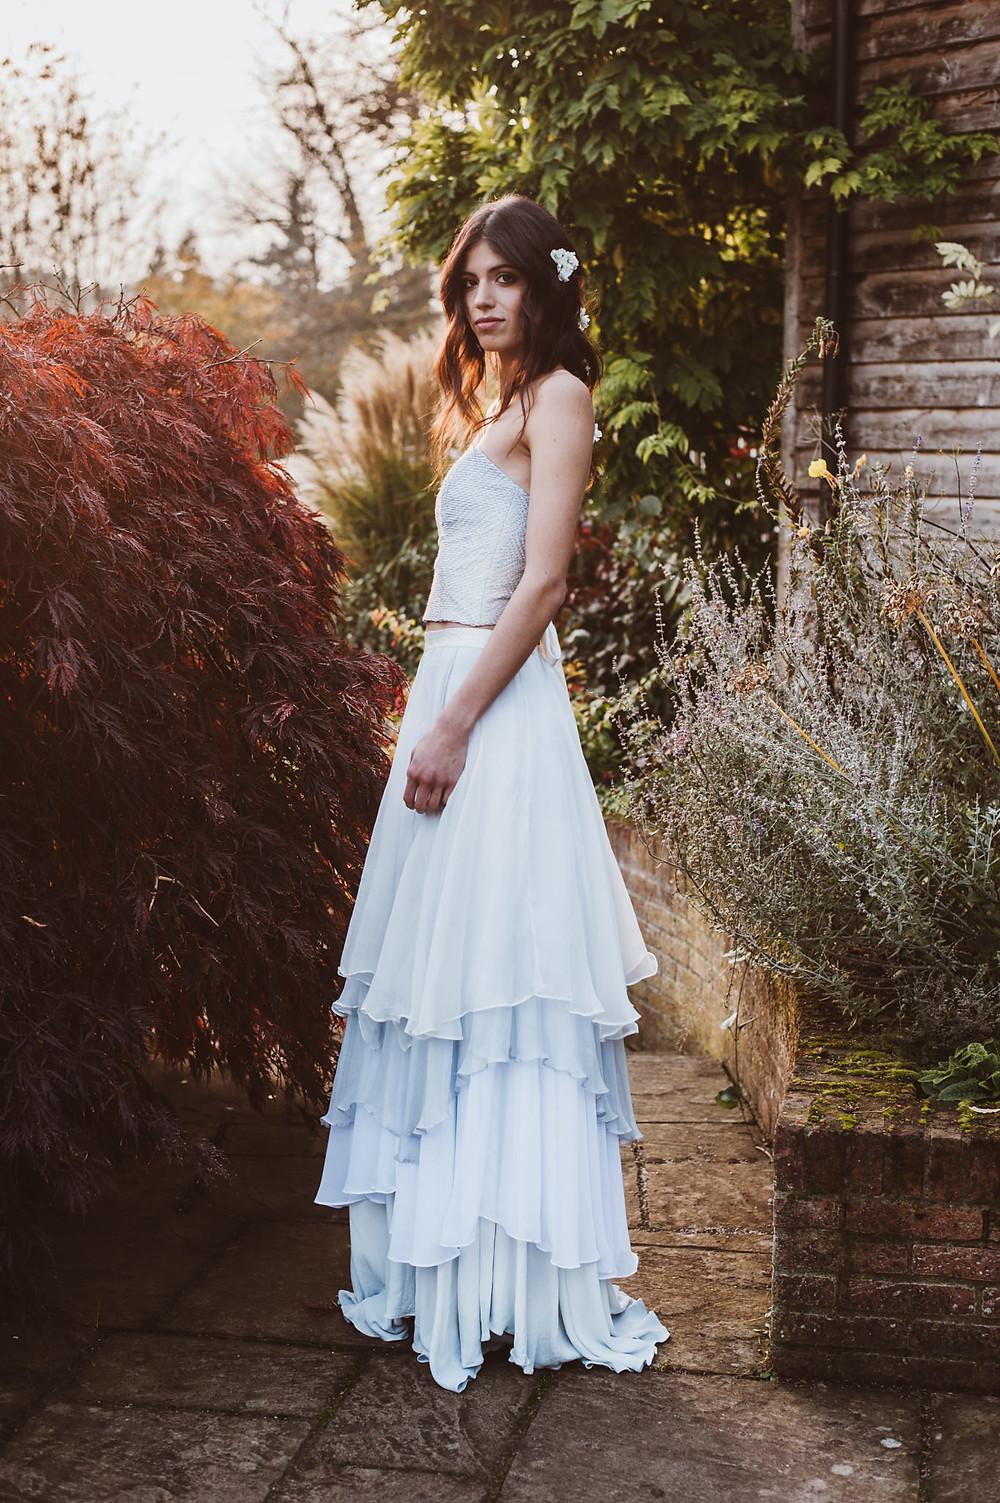 'Lobelia' Dip Dye Wedding Dress by Jessica Turner Designs